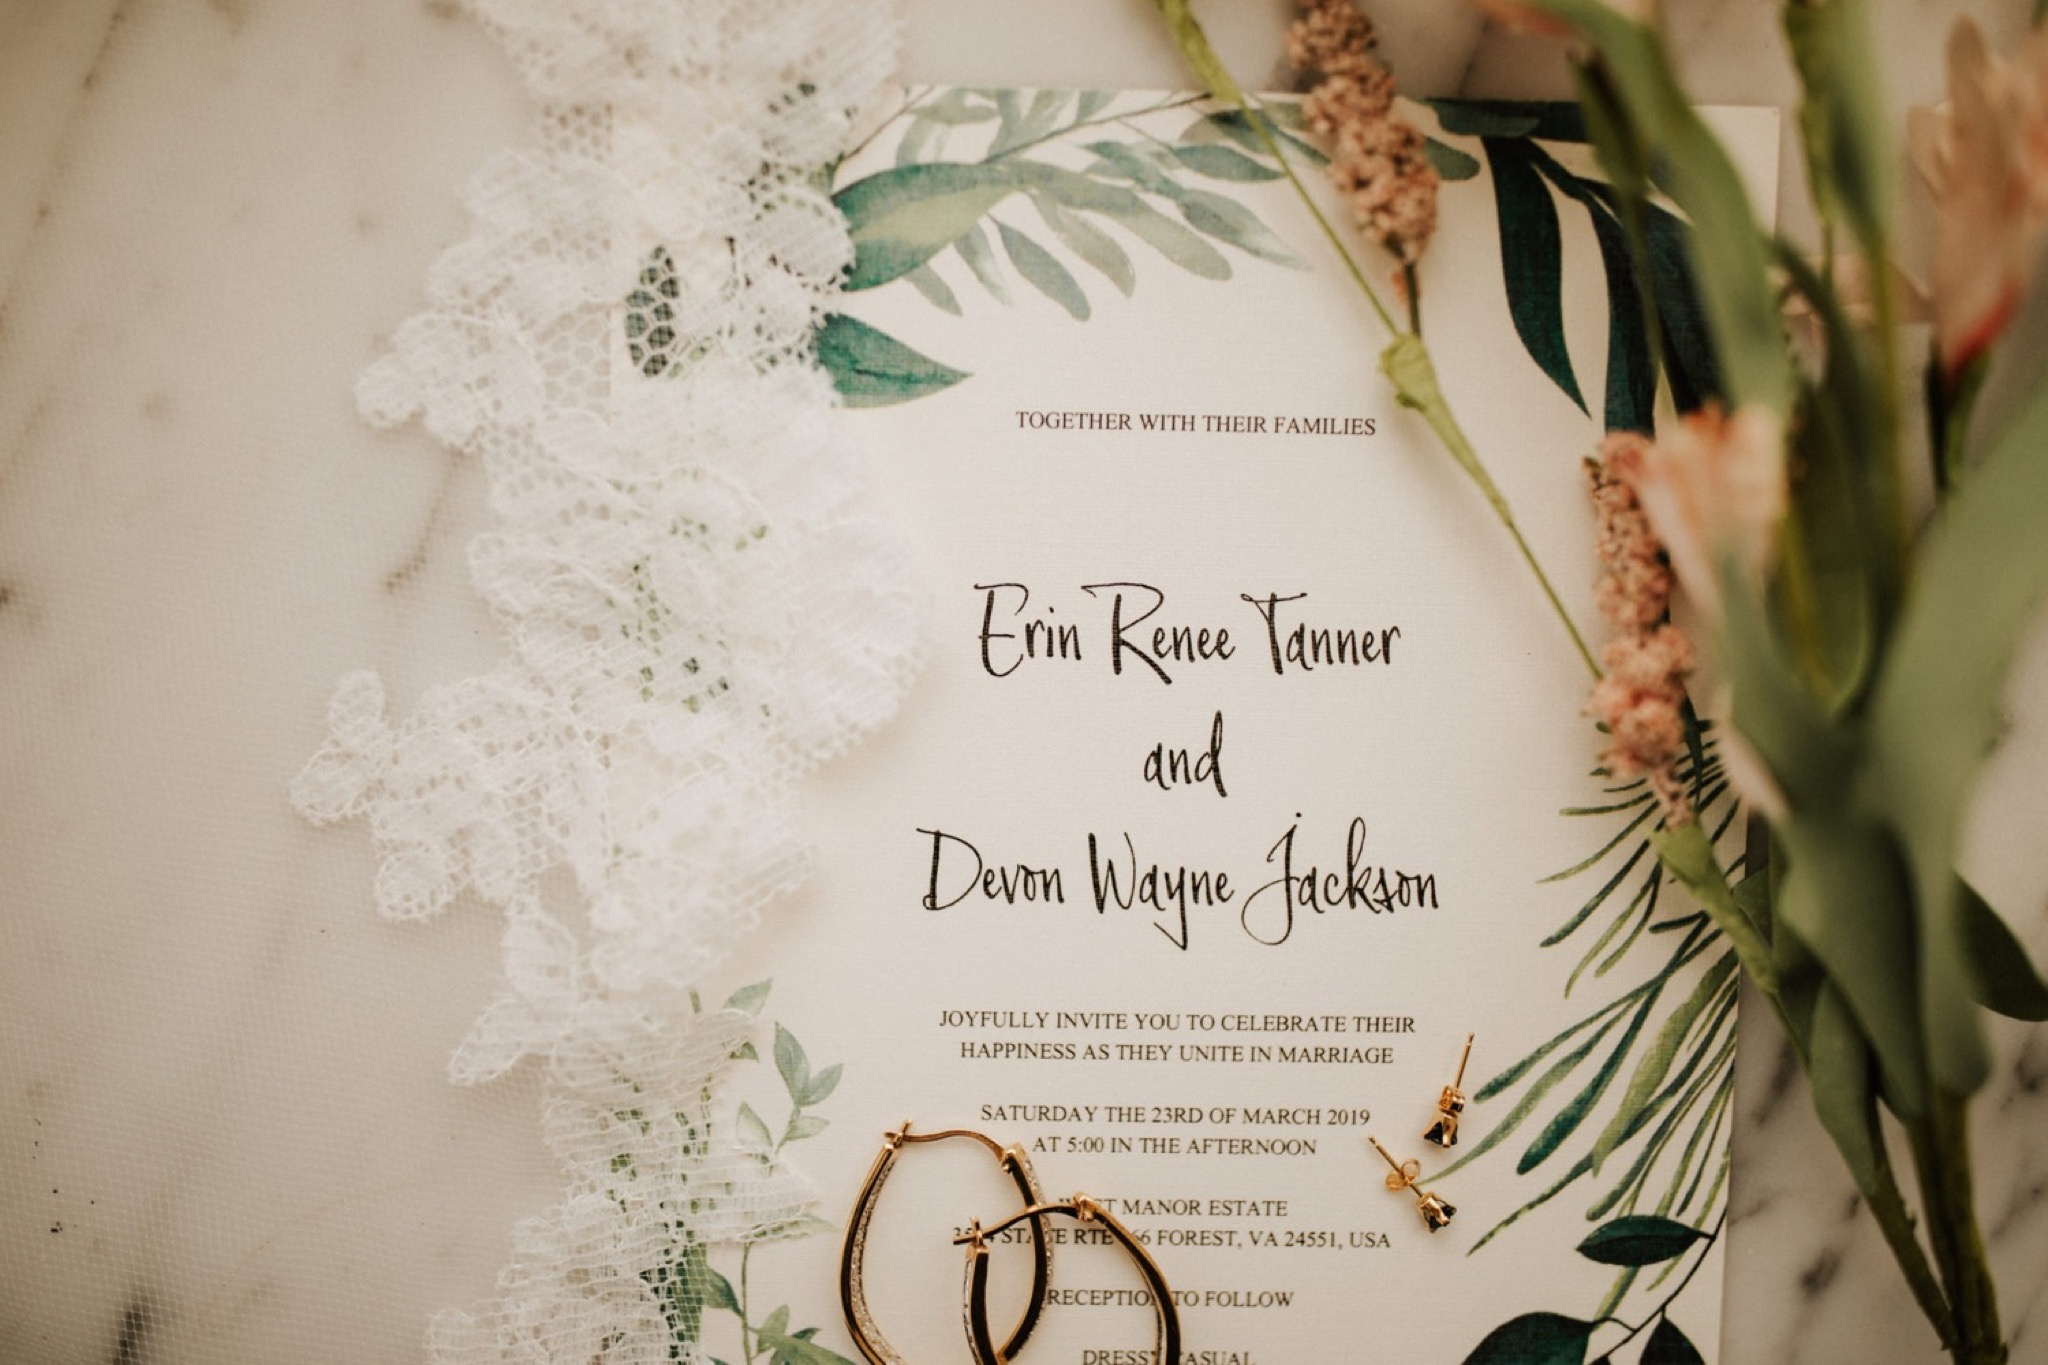 07_West Manor Estate Weddings - Pat Cori Photography-11_dustyblue_details_VirginiaWeddingPhotographer_WestManorEstate_PatCoriPhotography_Sage.jpg